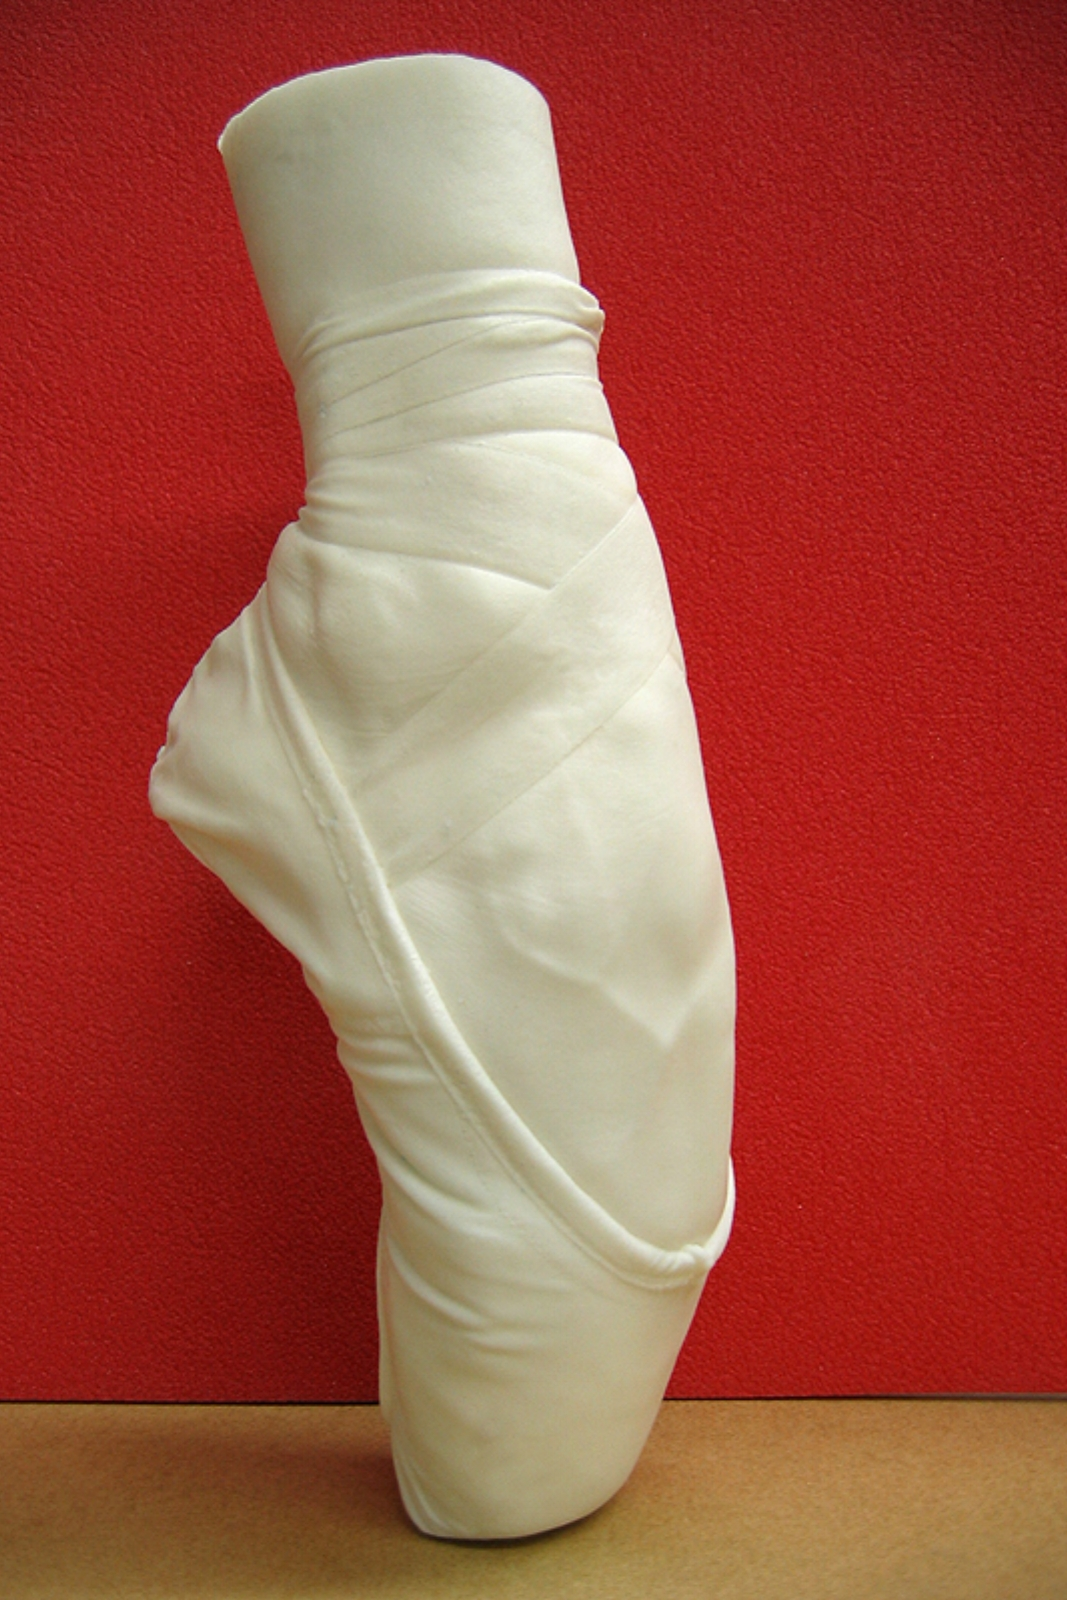 09_Ballet Shoe.jpg